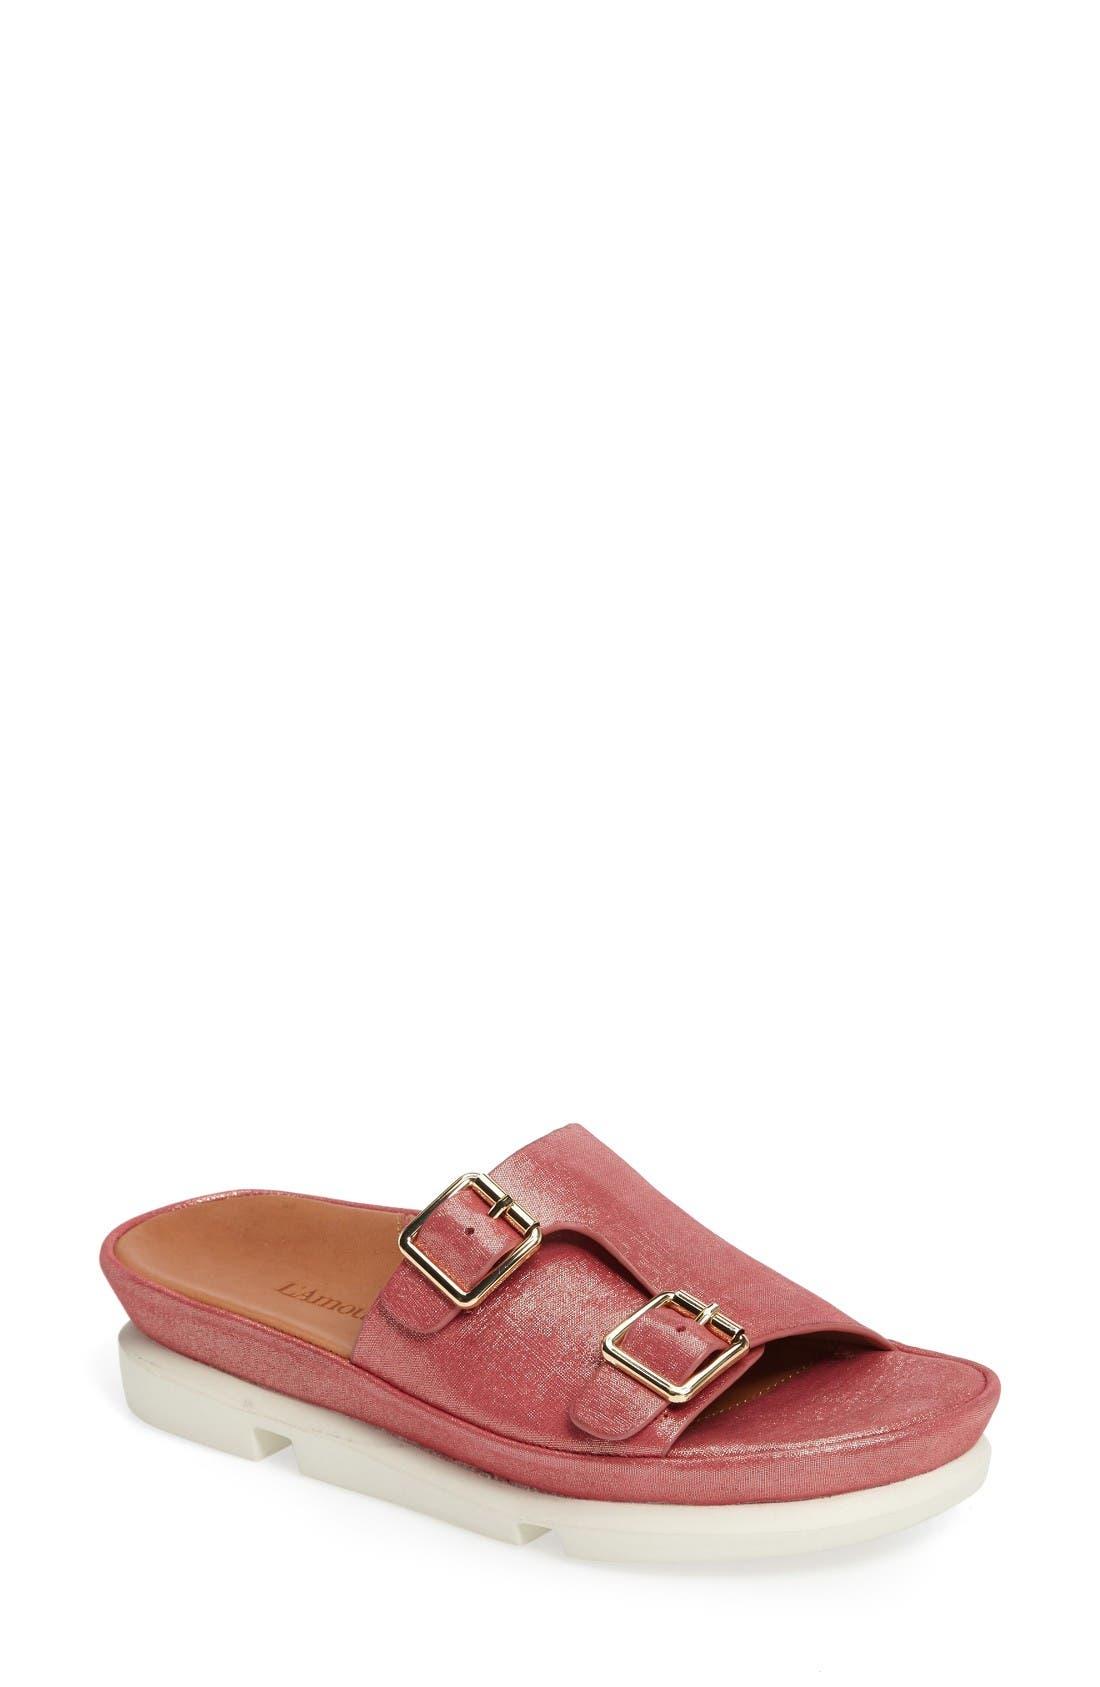 L'Amour des Pieds Viareggio Slide Sandal (Women)